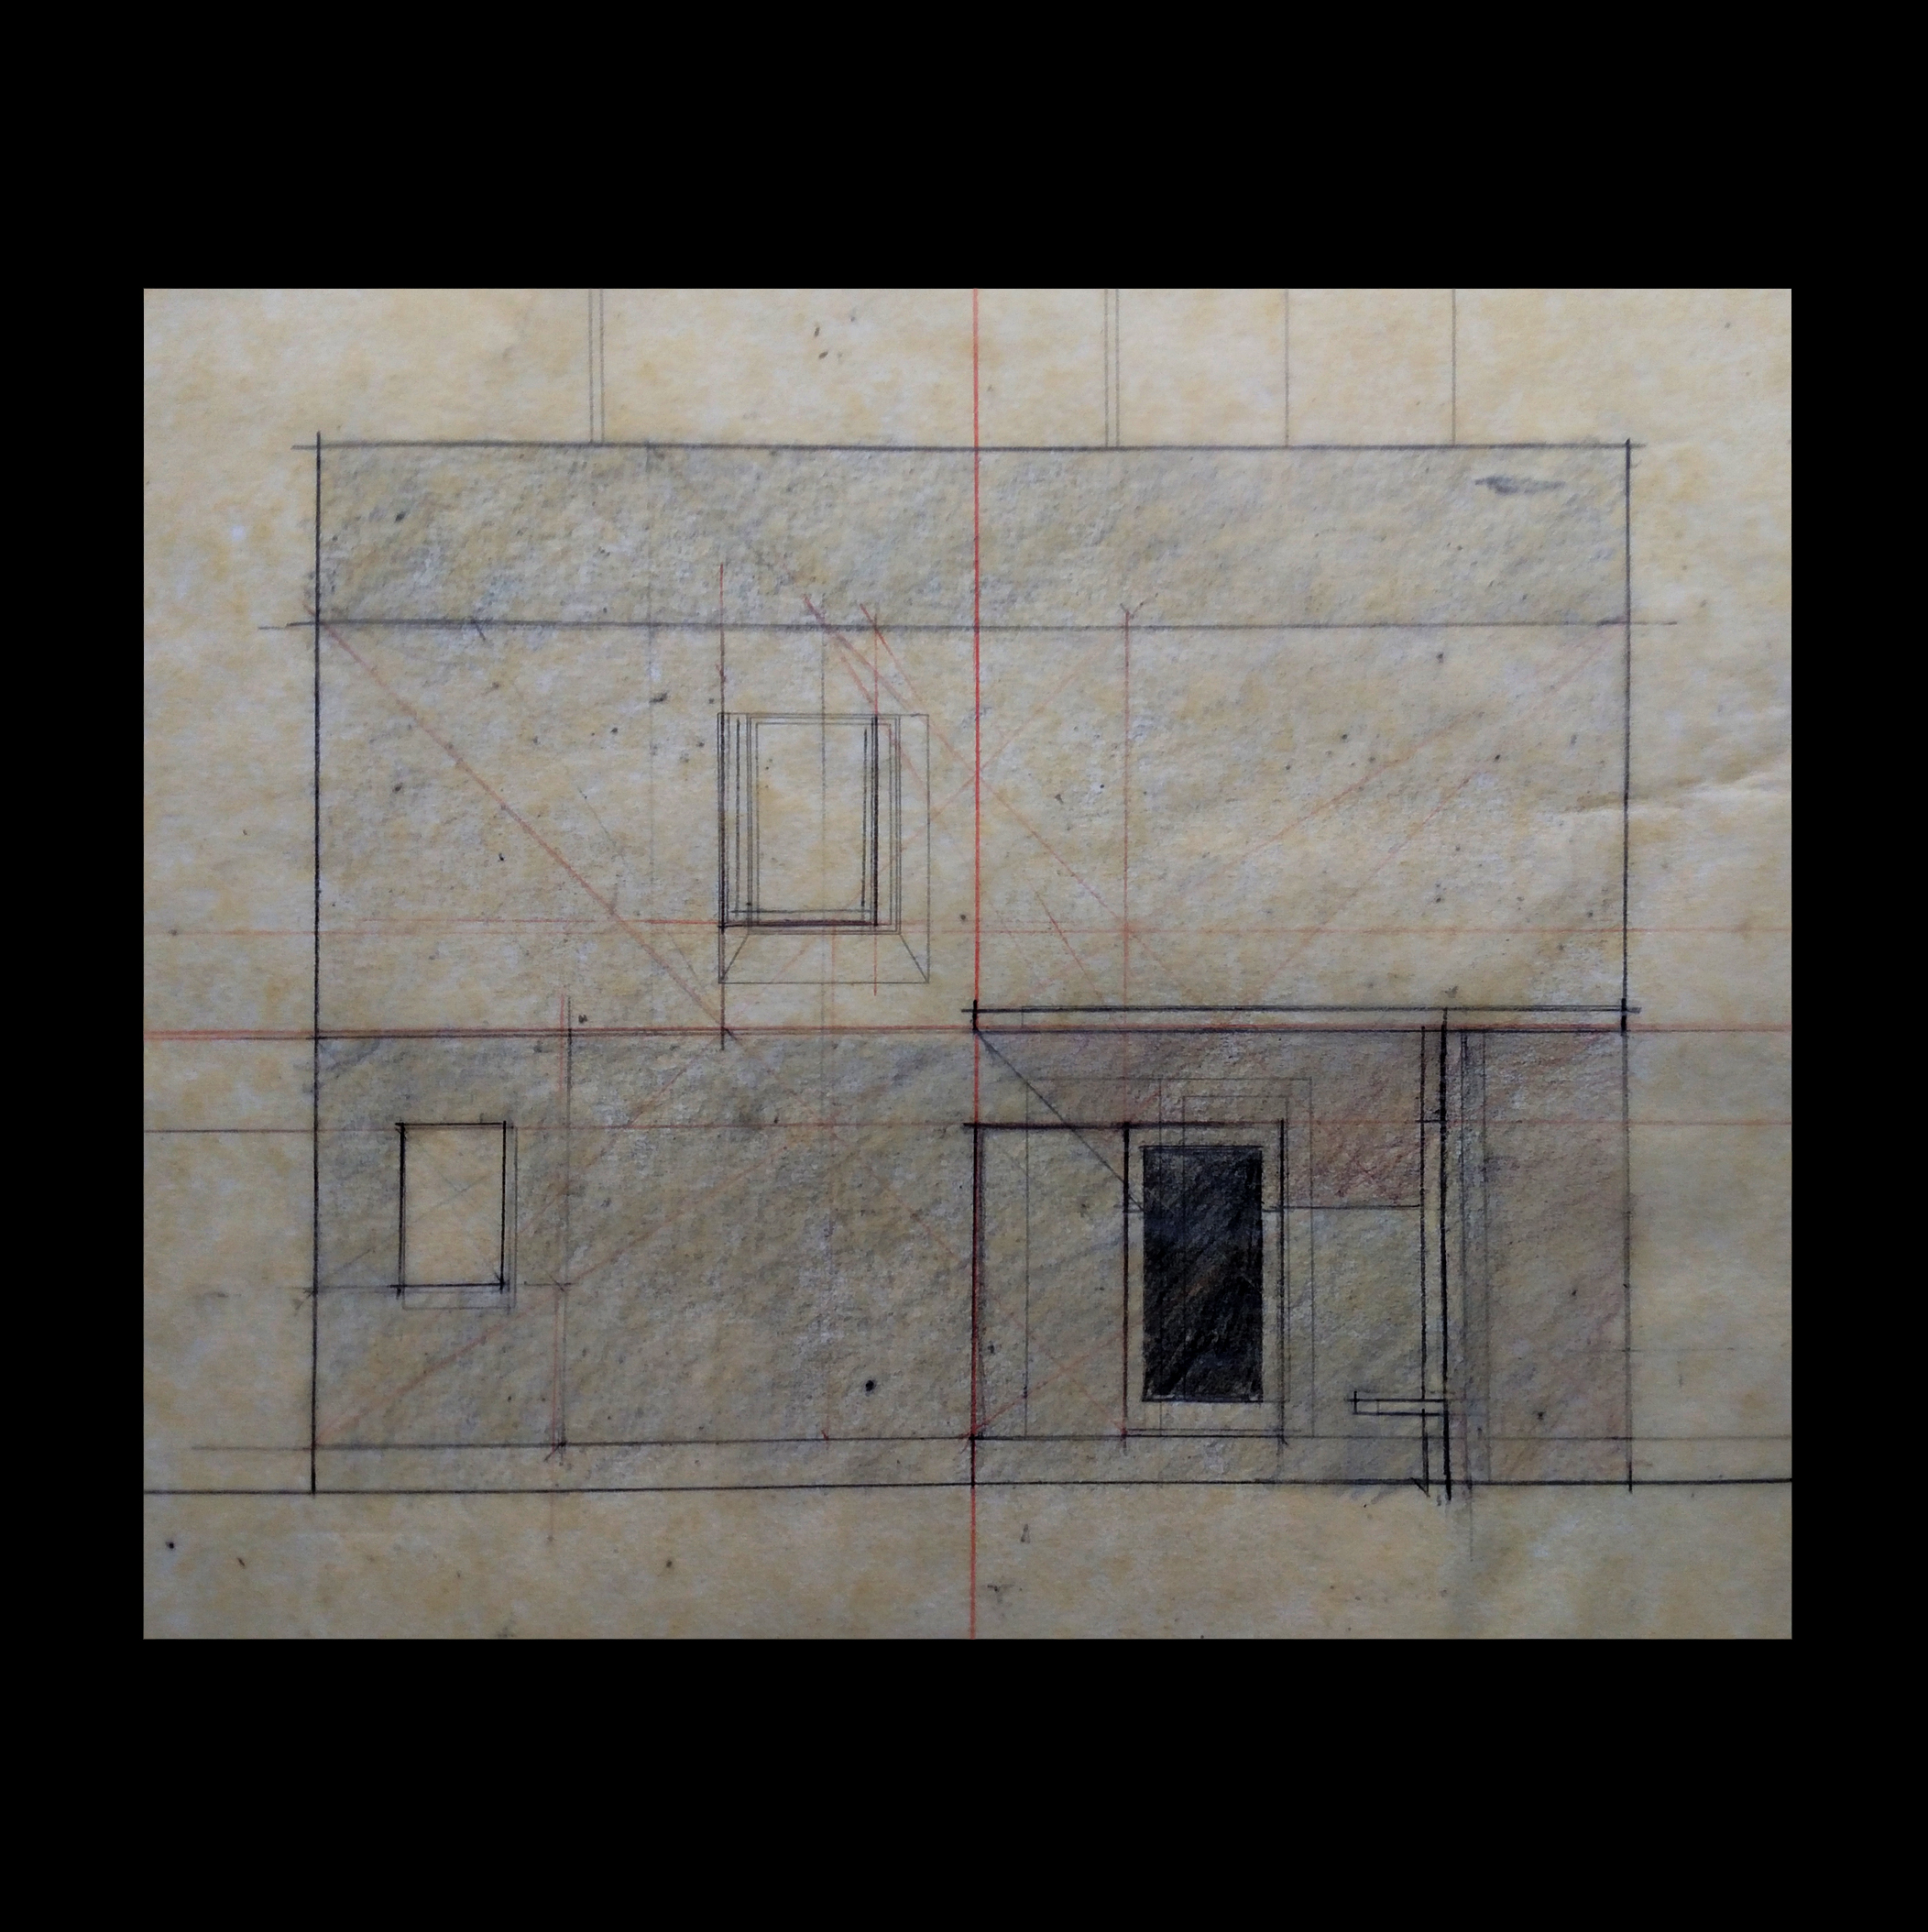 concrete house elevation study.jpg